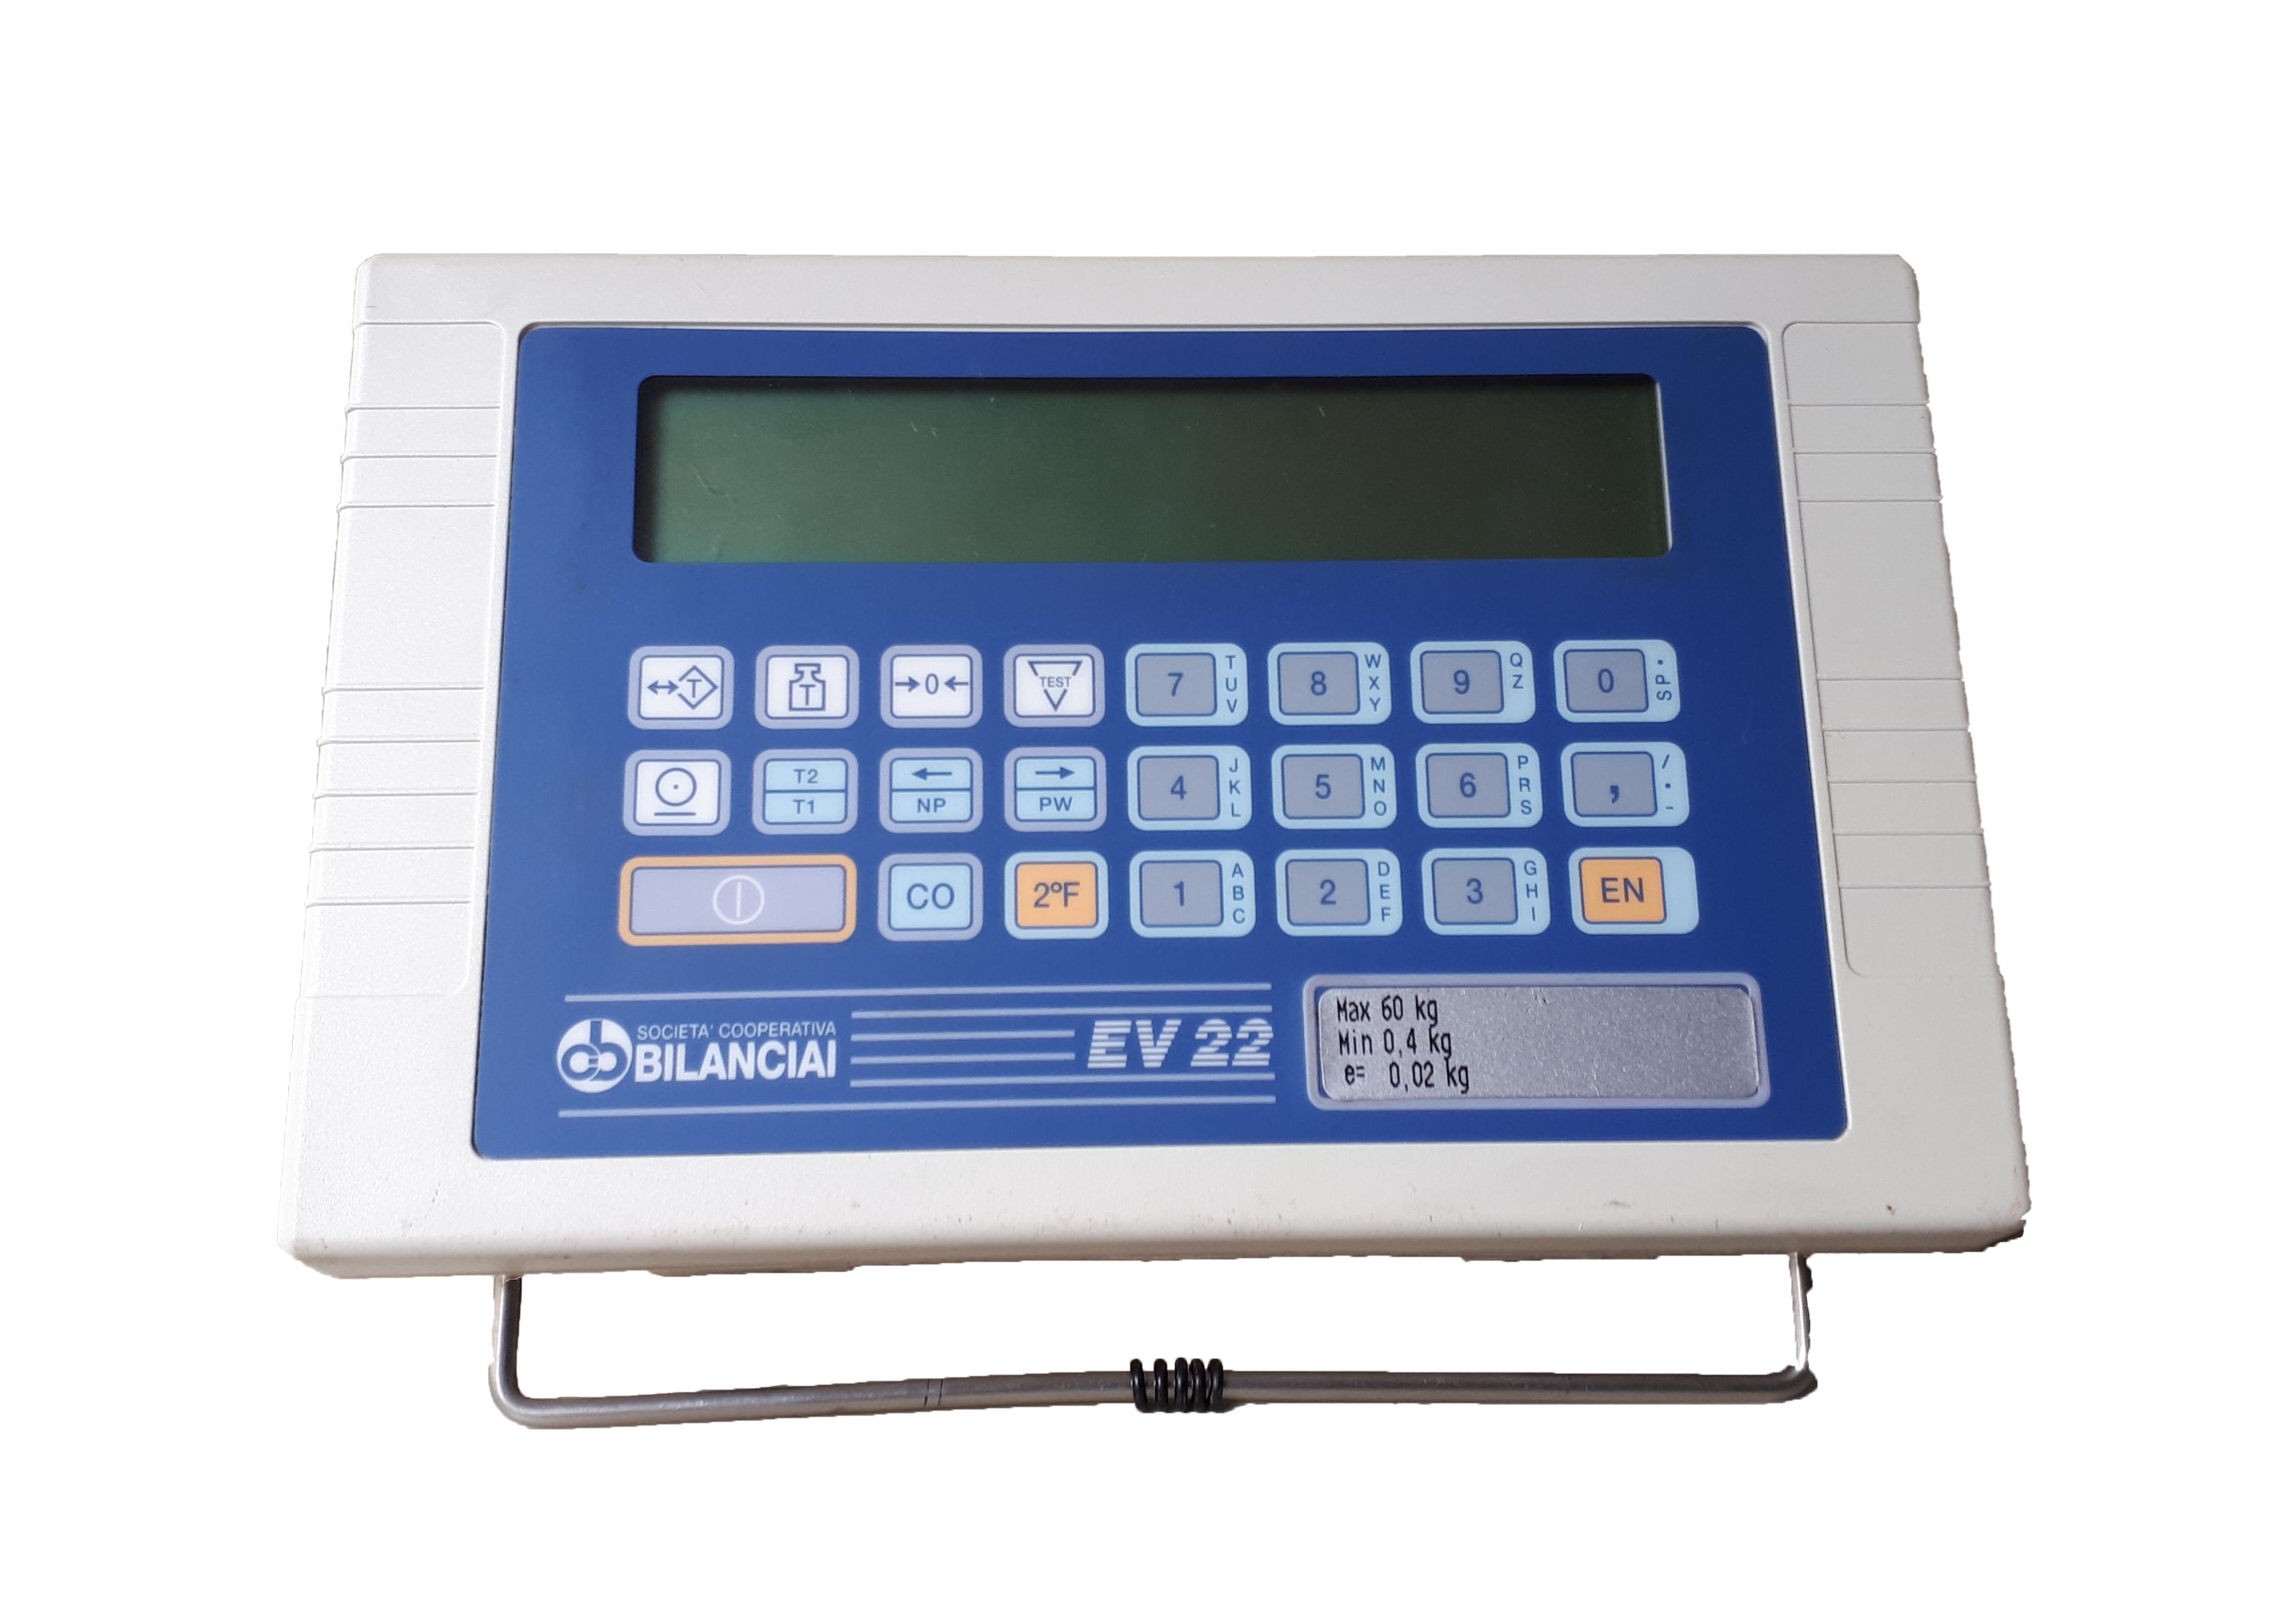 Indicateur de balance industrielle Bilanciai EV22